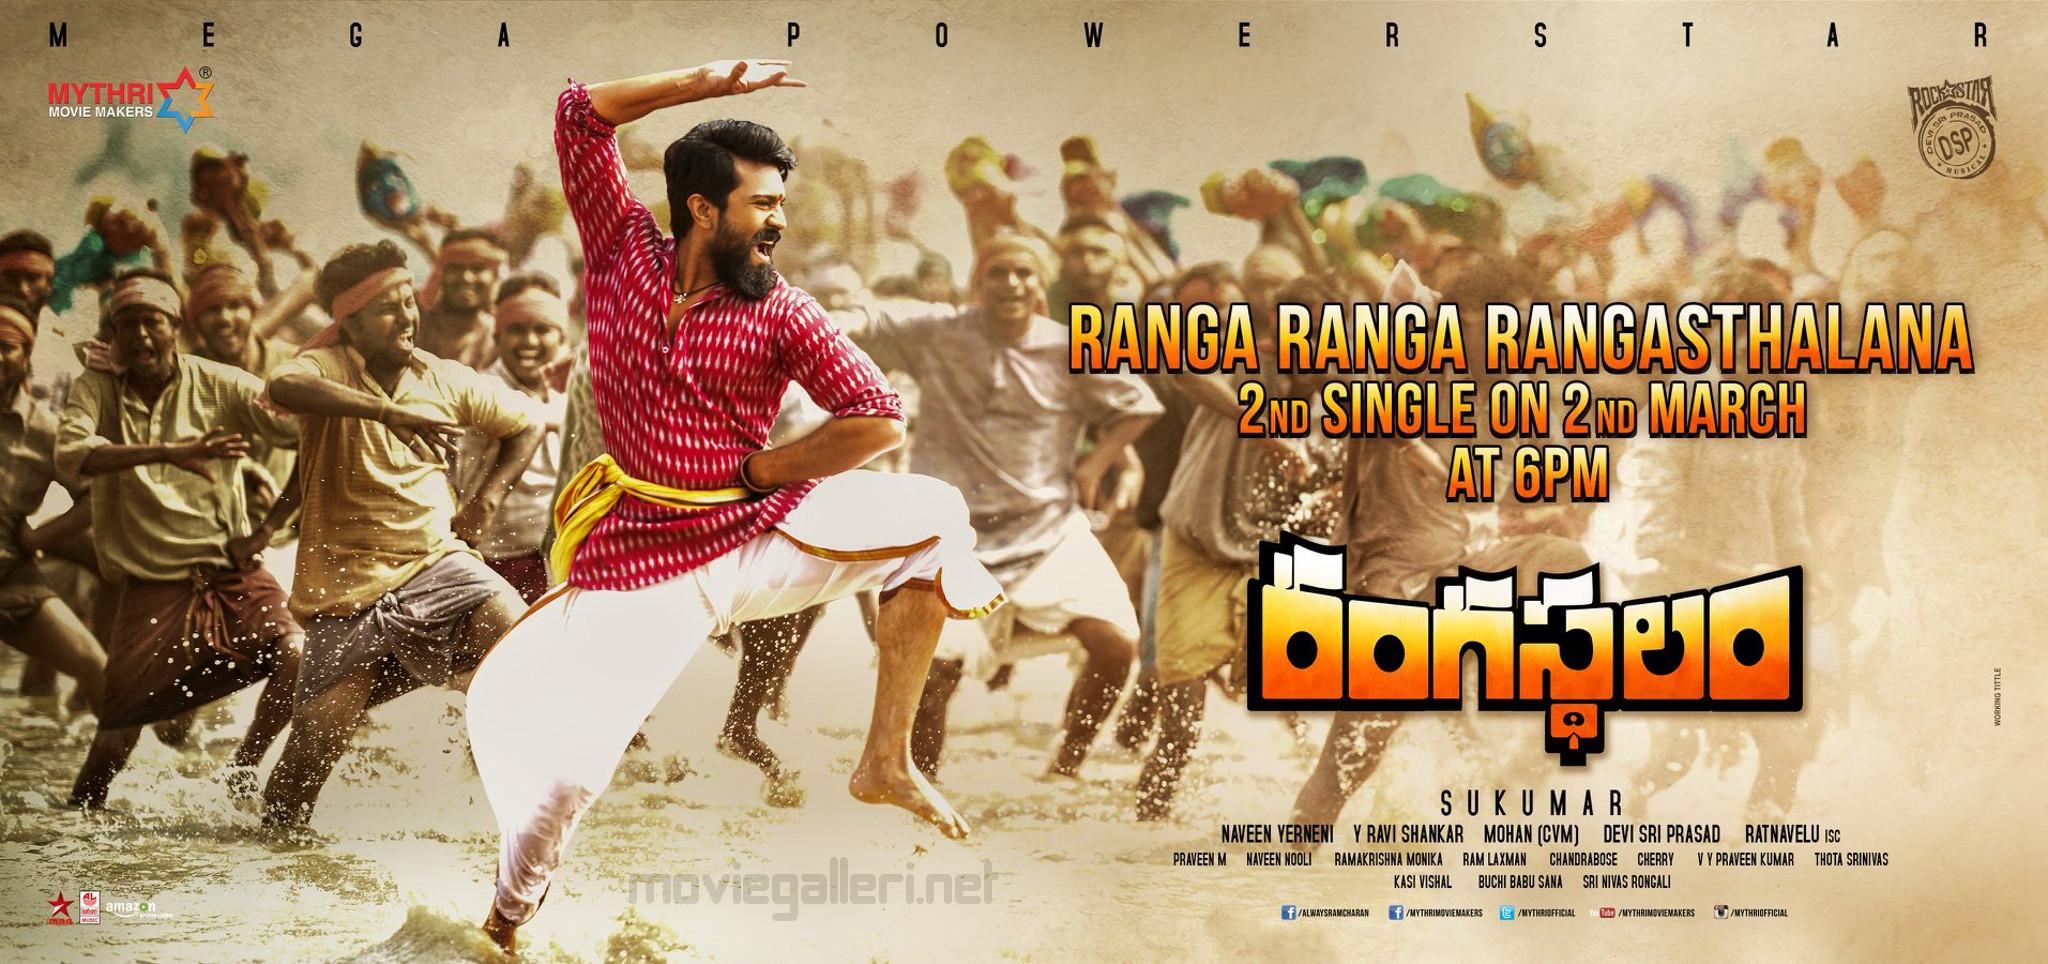 Rangasthalam 2nd single Ranga Ranga Rangasthalana Song on 2nd March Wallpaper